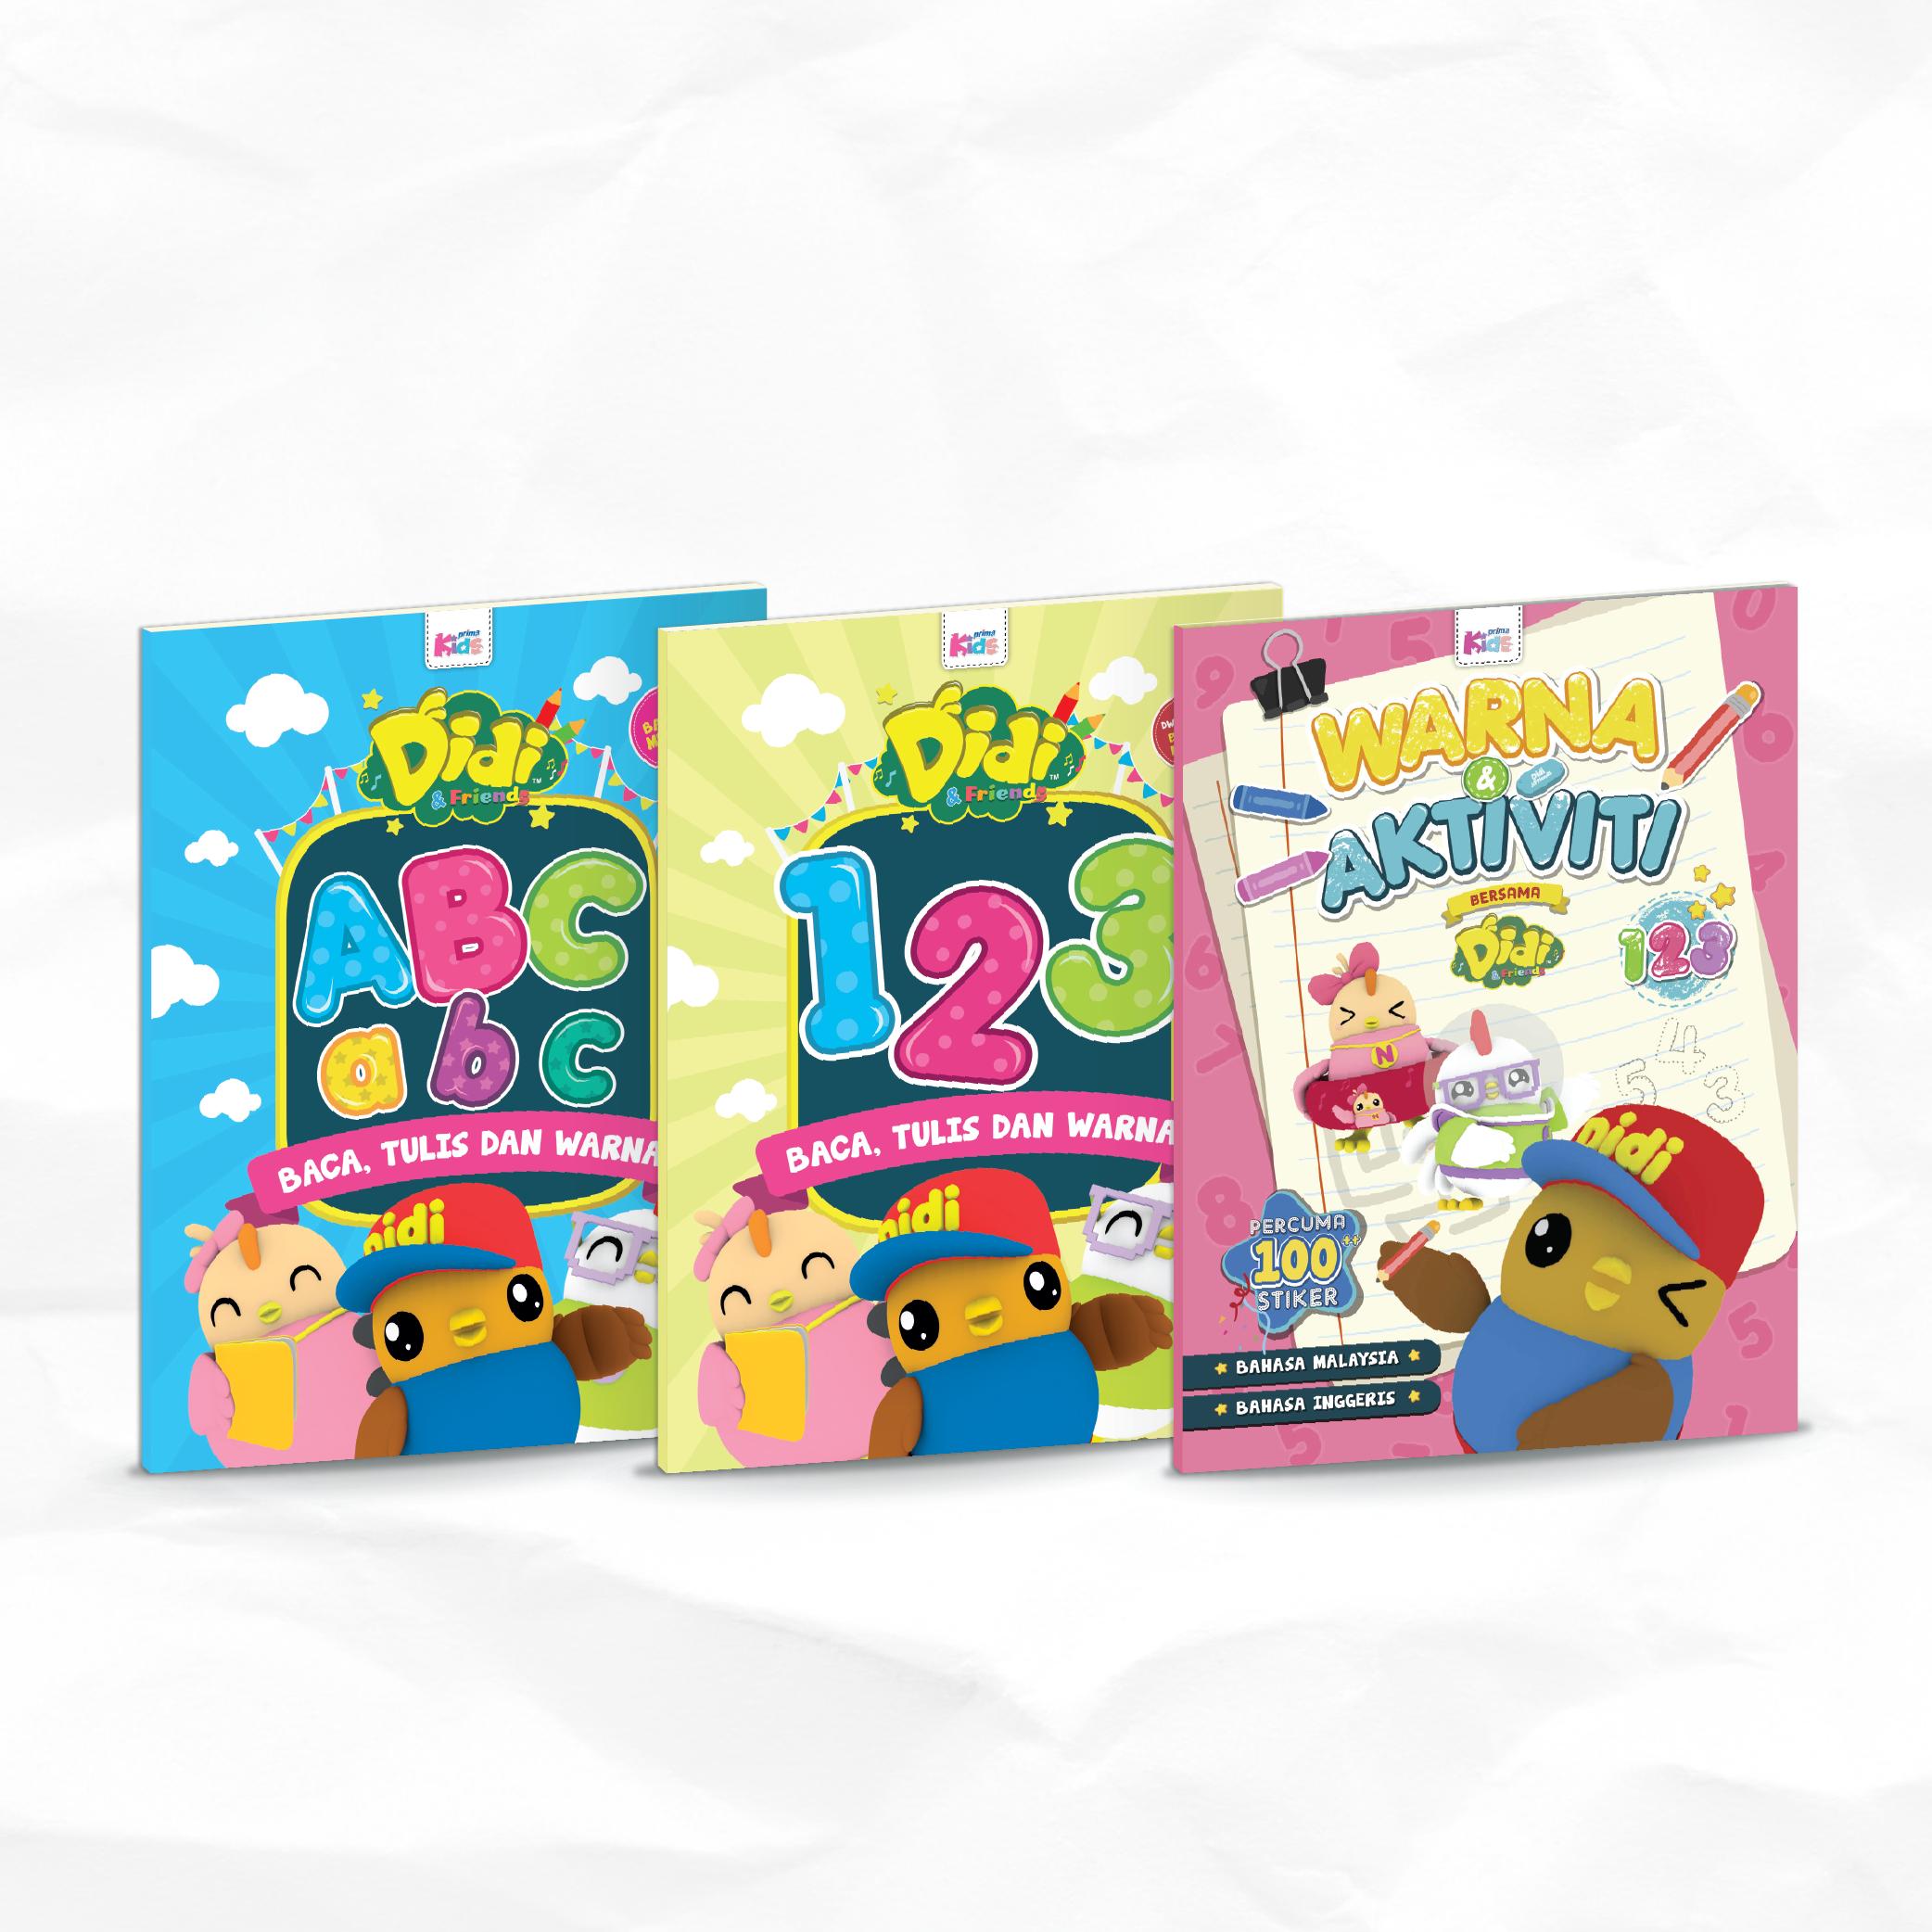 Activity Books For Preschoolers Didi Friends Activity Books For Toddlers Friends Merchandise Toddler Books